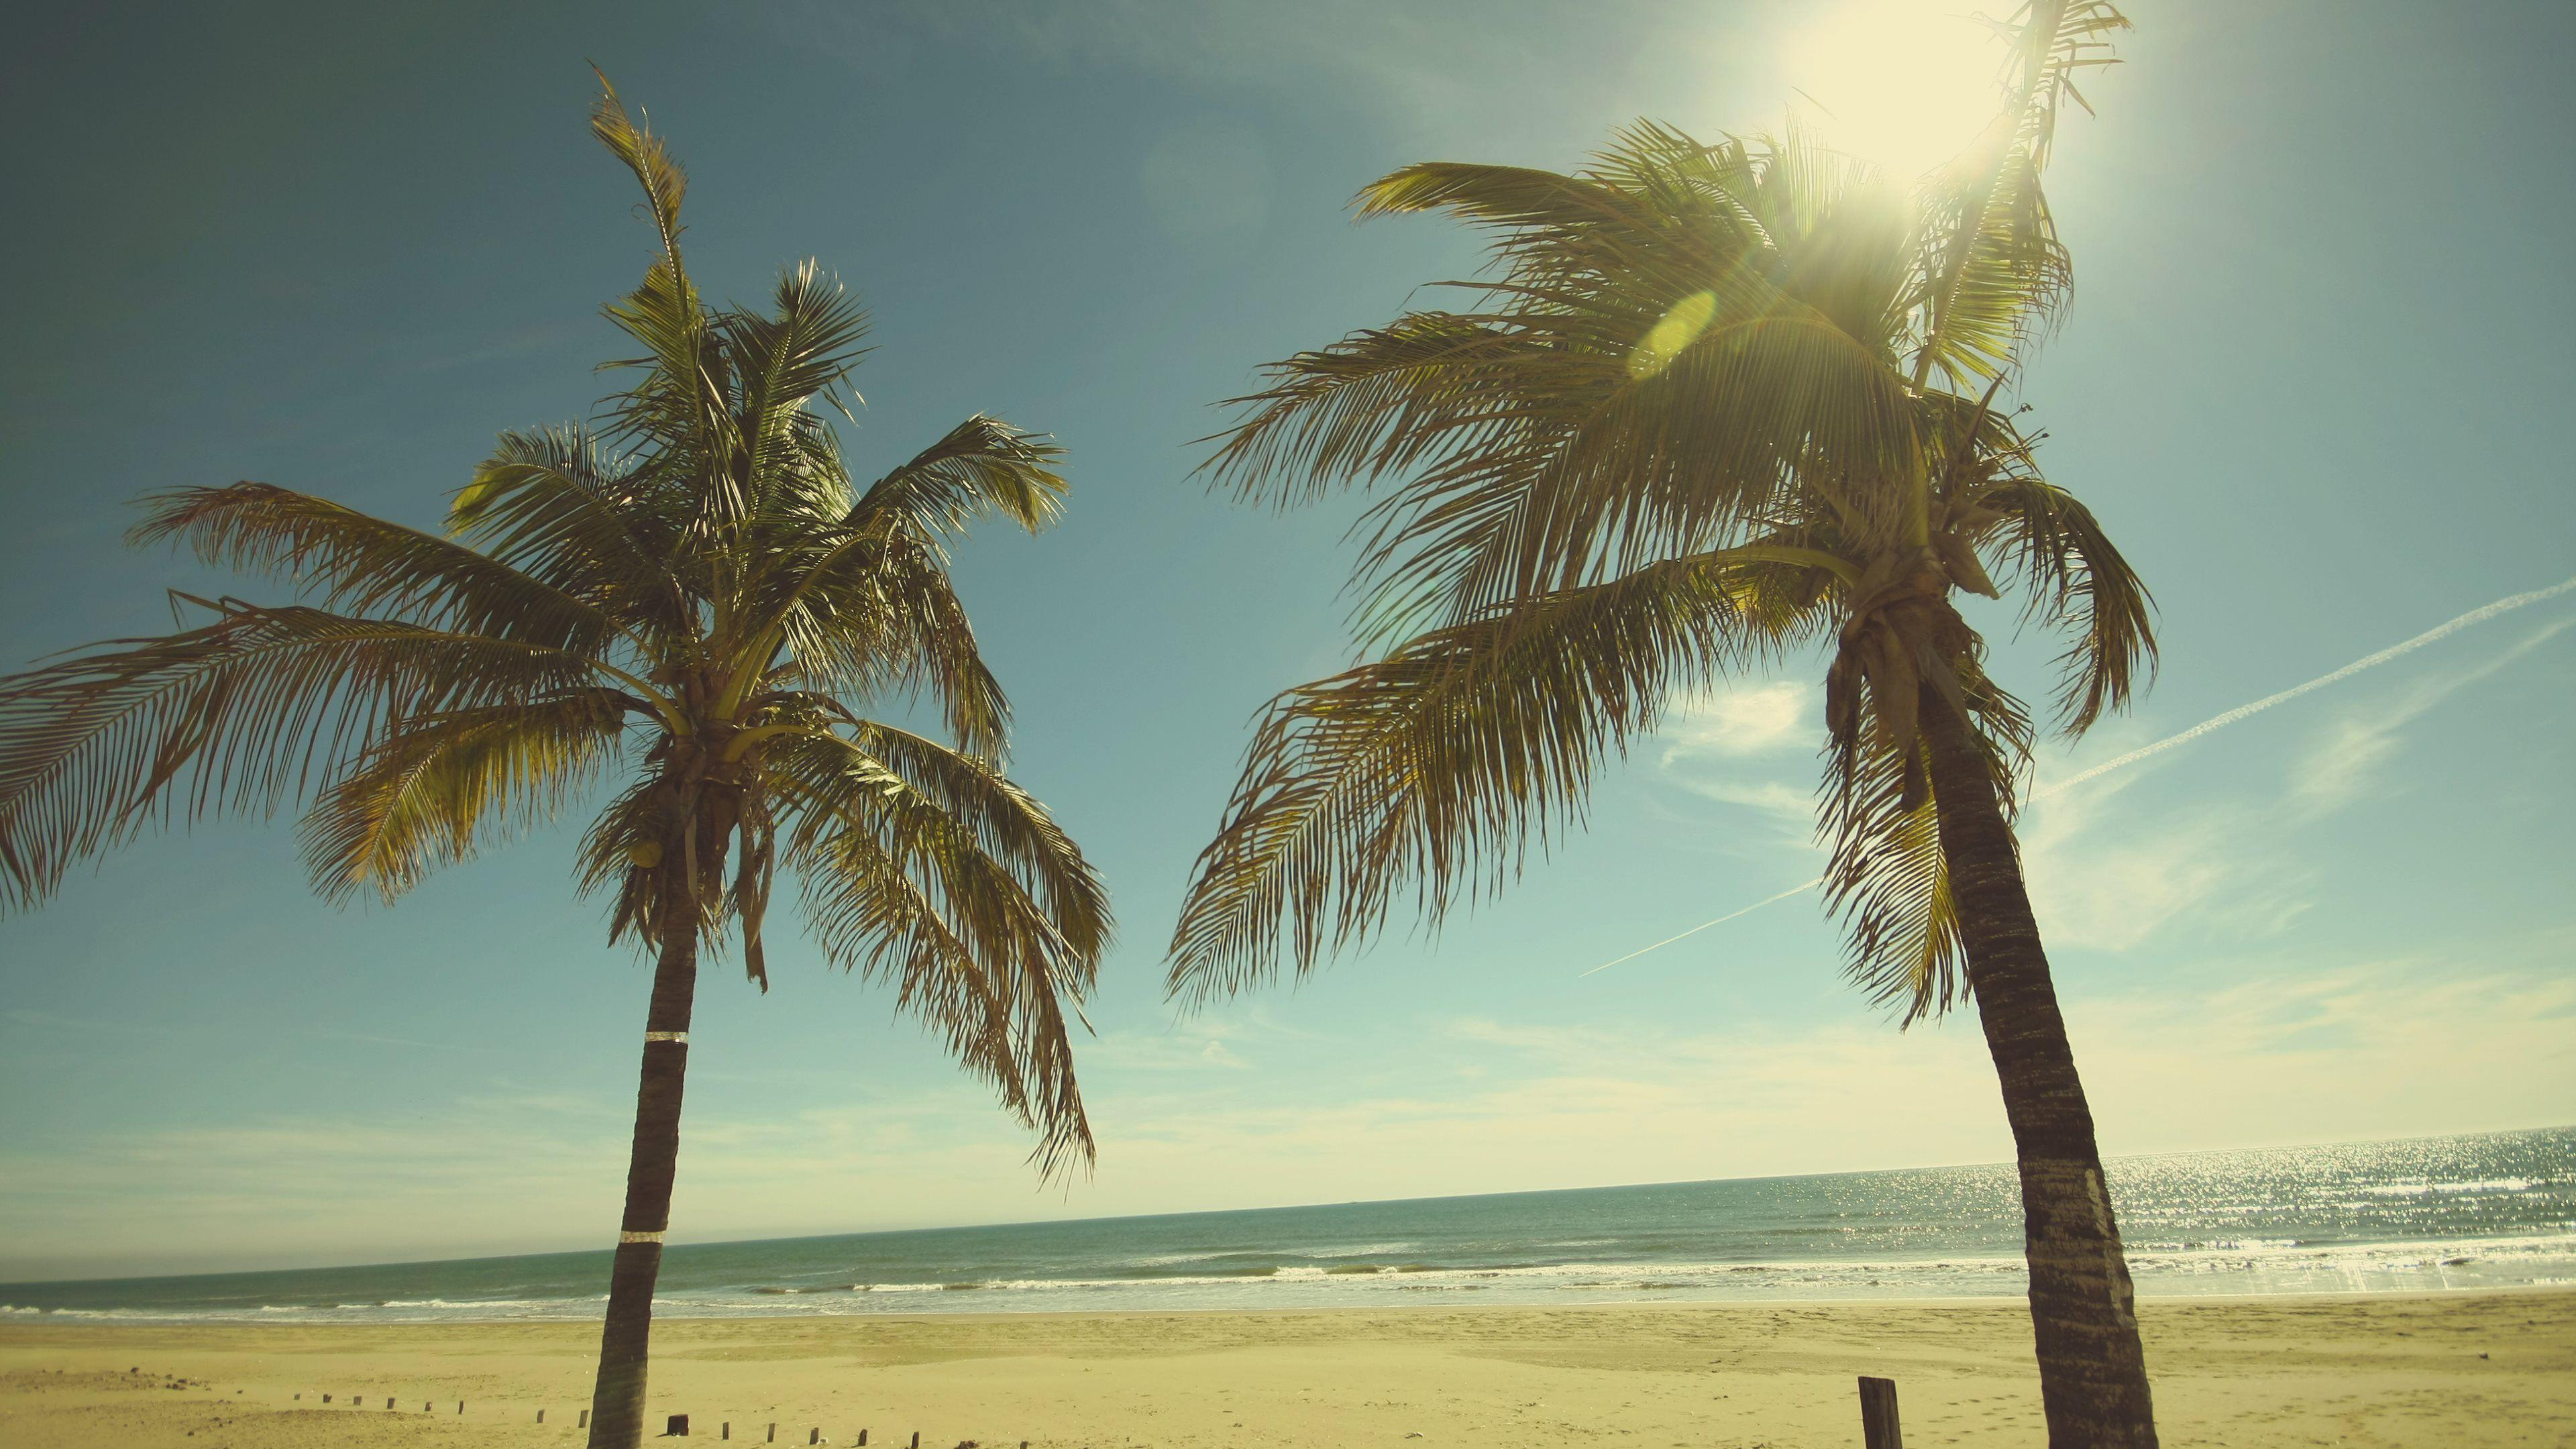 sunny+palm+trees+beach+sand_ultra+hd (3840×2160) | 나무